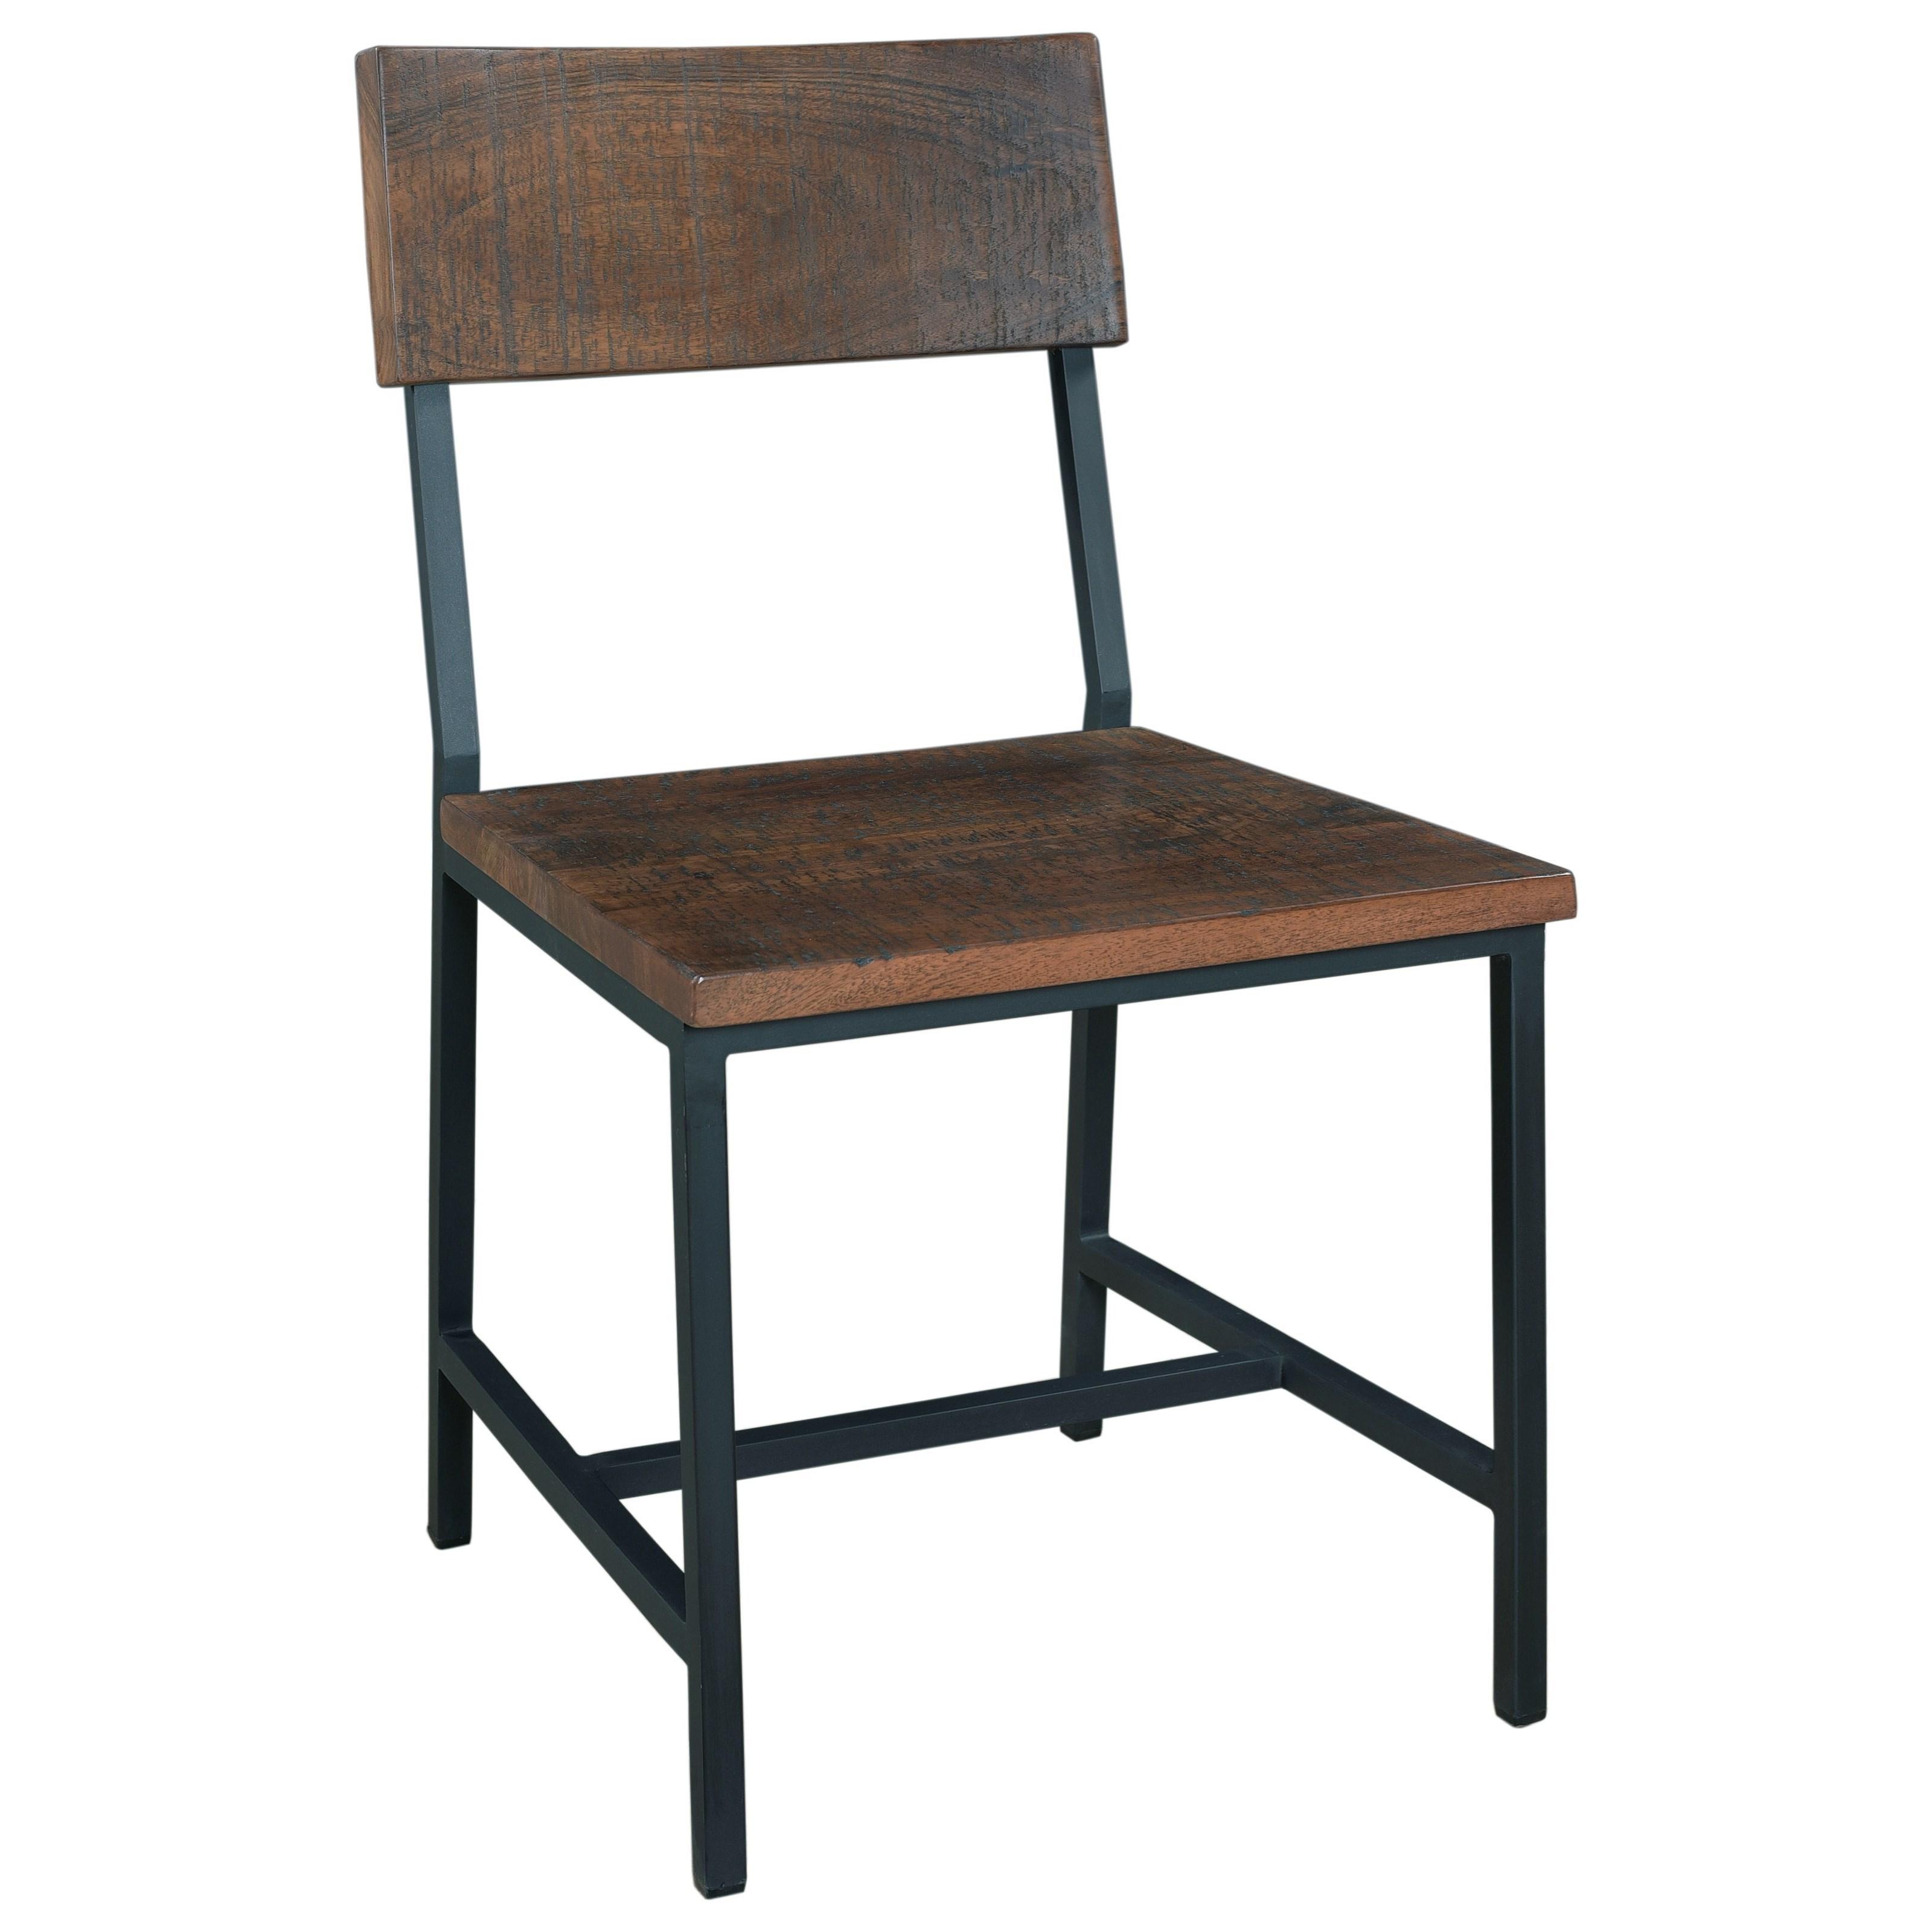 Coast to Coast Accents Dining Chair  by Coast to Coast Imports at Johnny Janosik